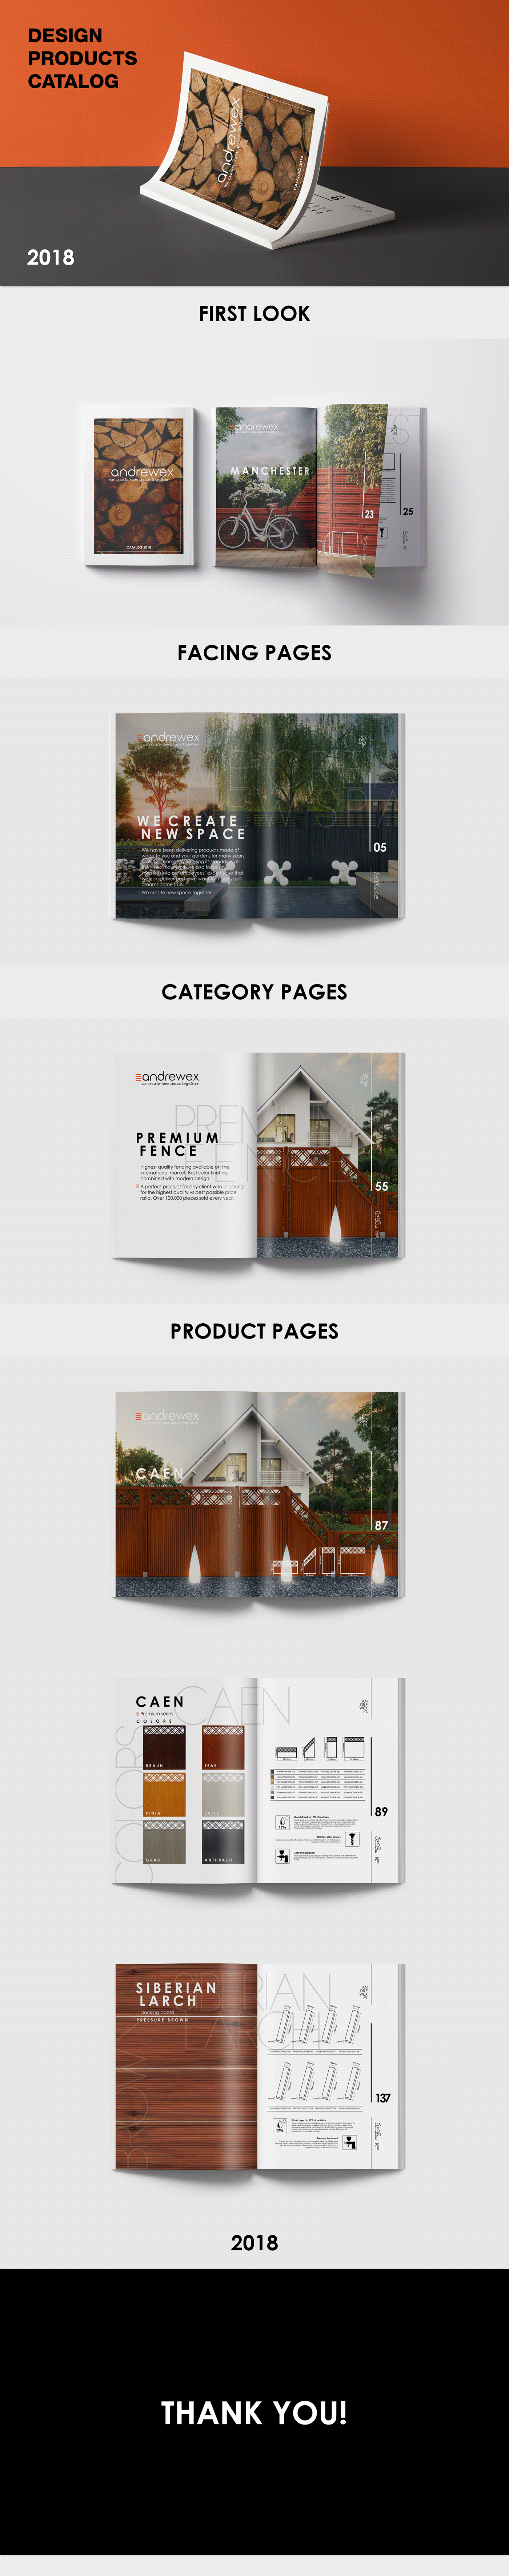 catalog design Project Catalogue